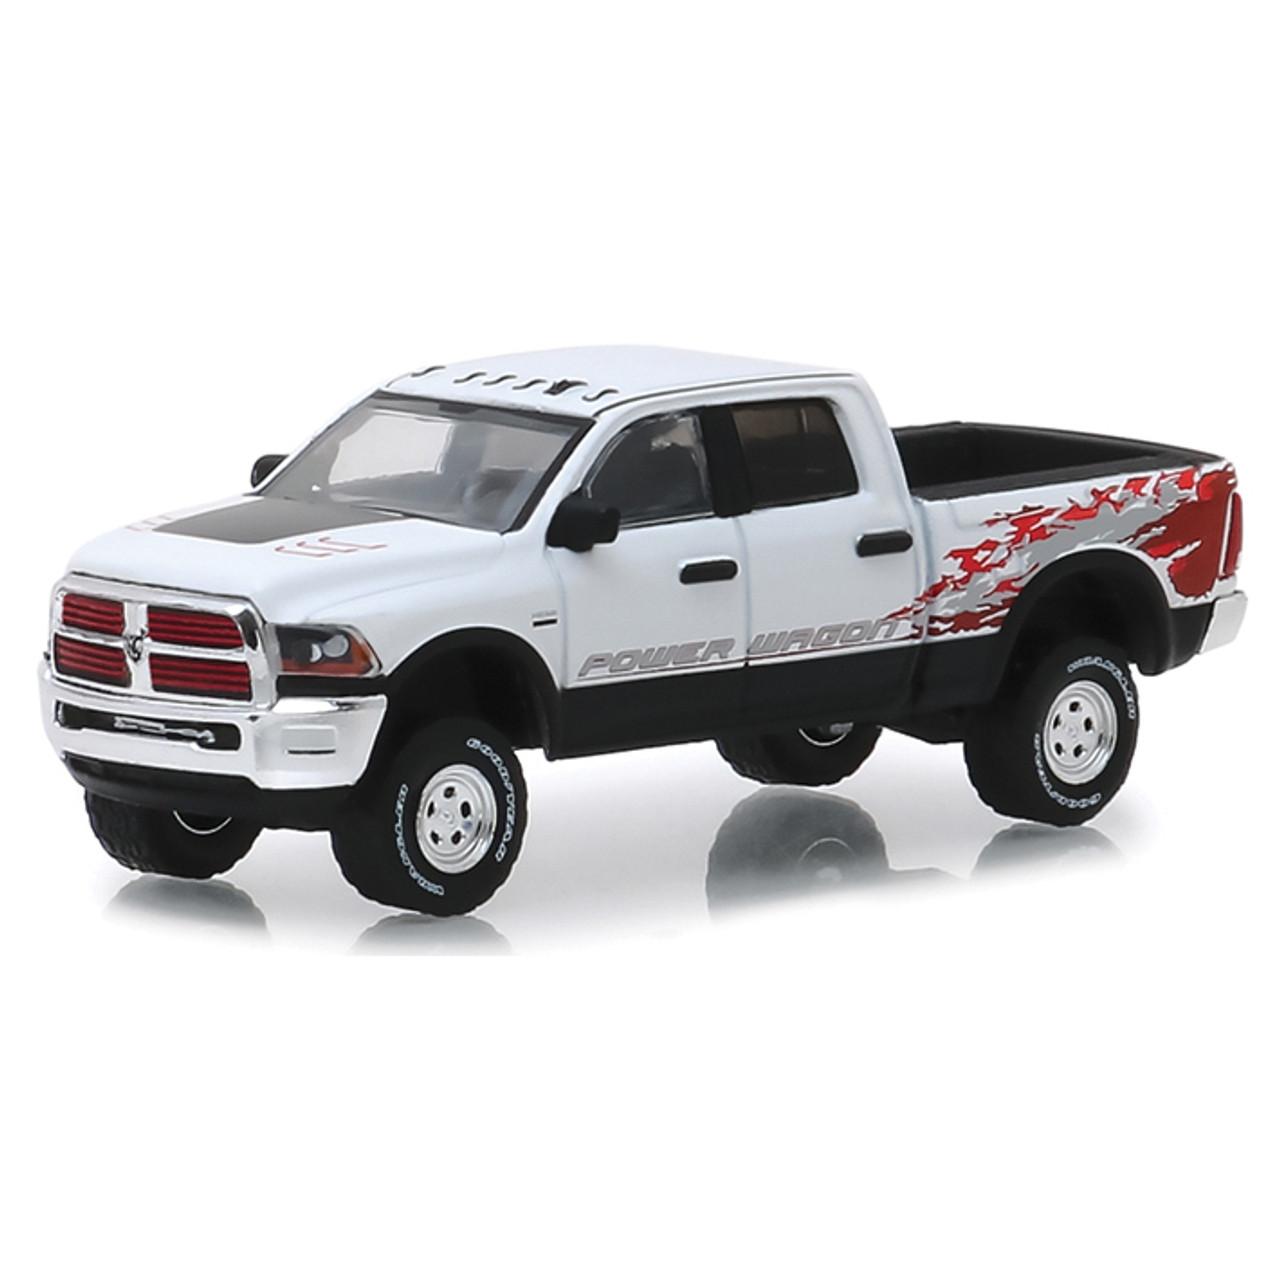 2016 Ram 2500 >> 2016 Ram 2500 Power Wagon White 1 64 Scale Diecast Model By Greenlight